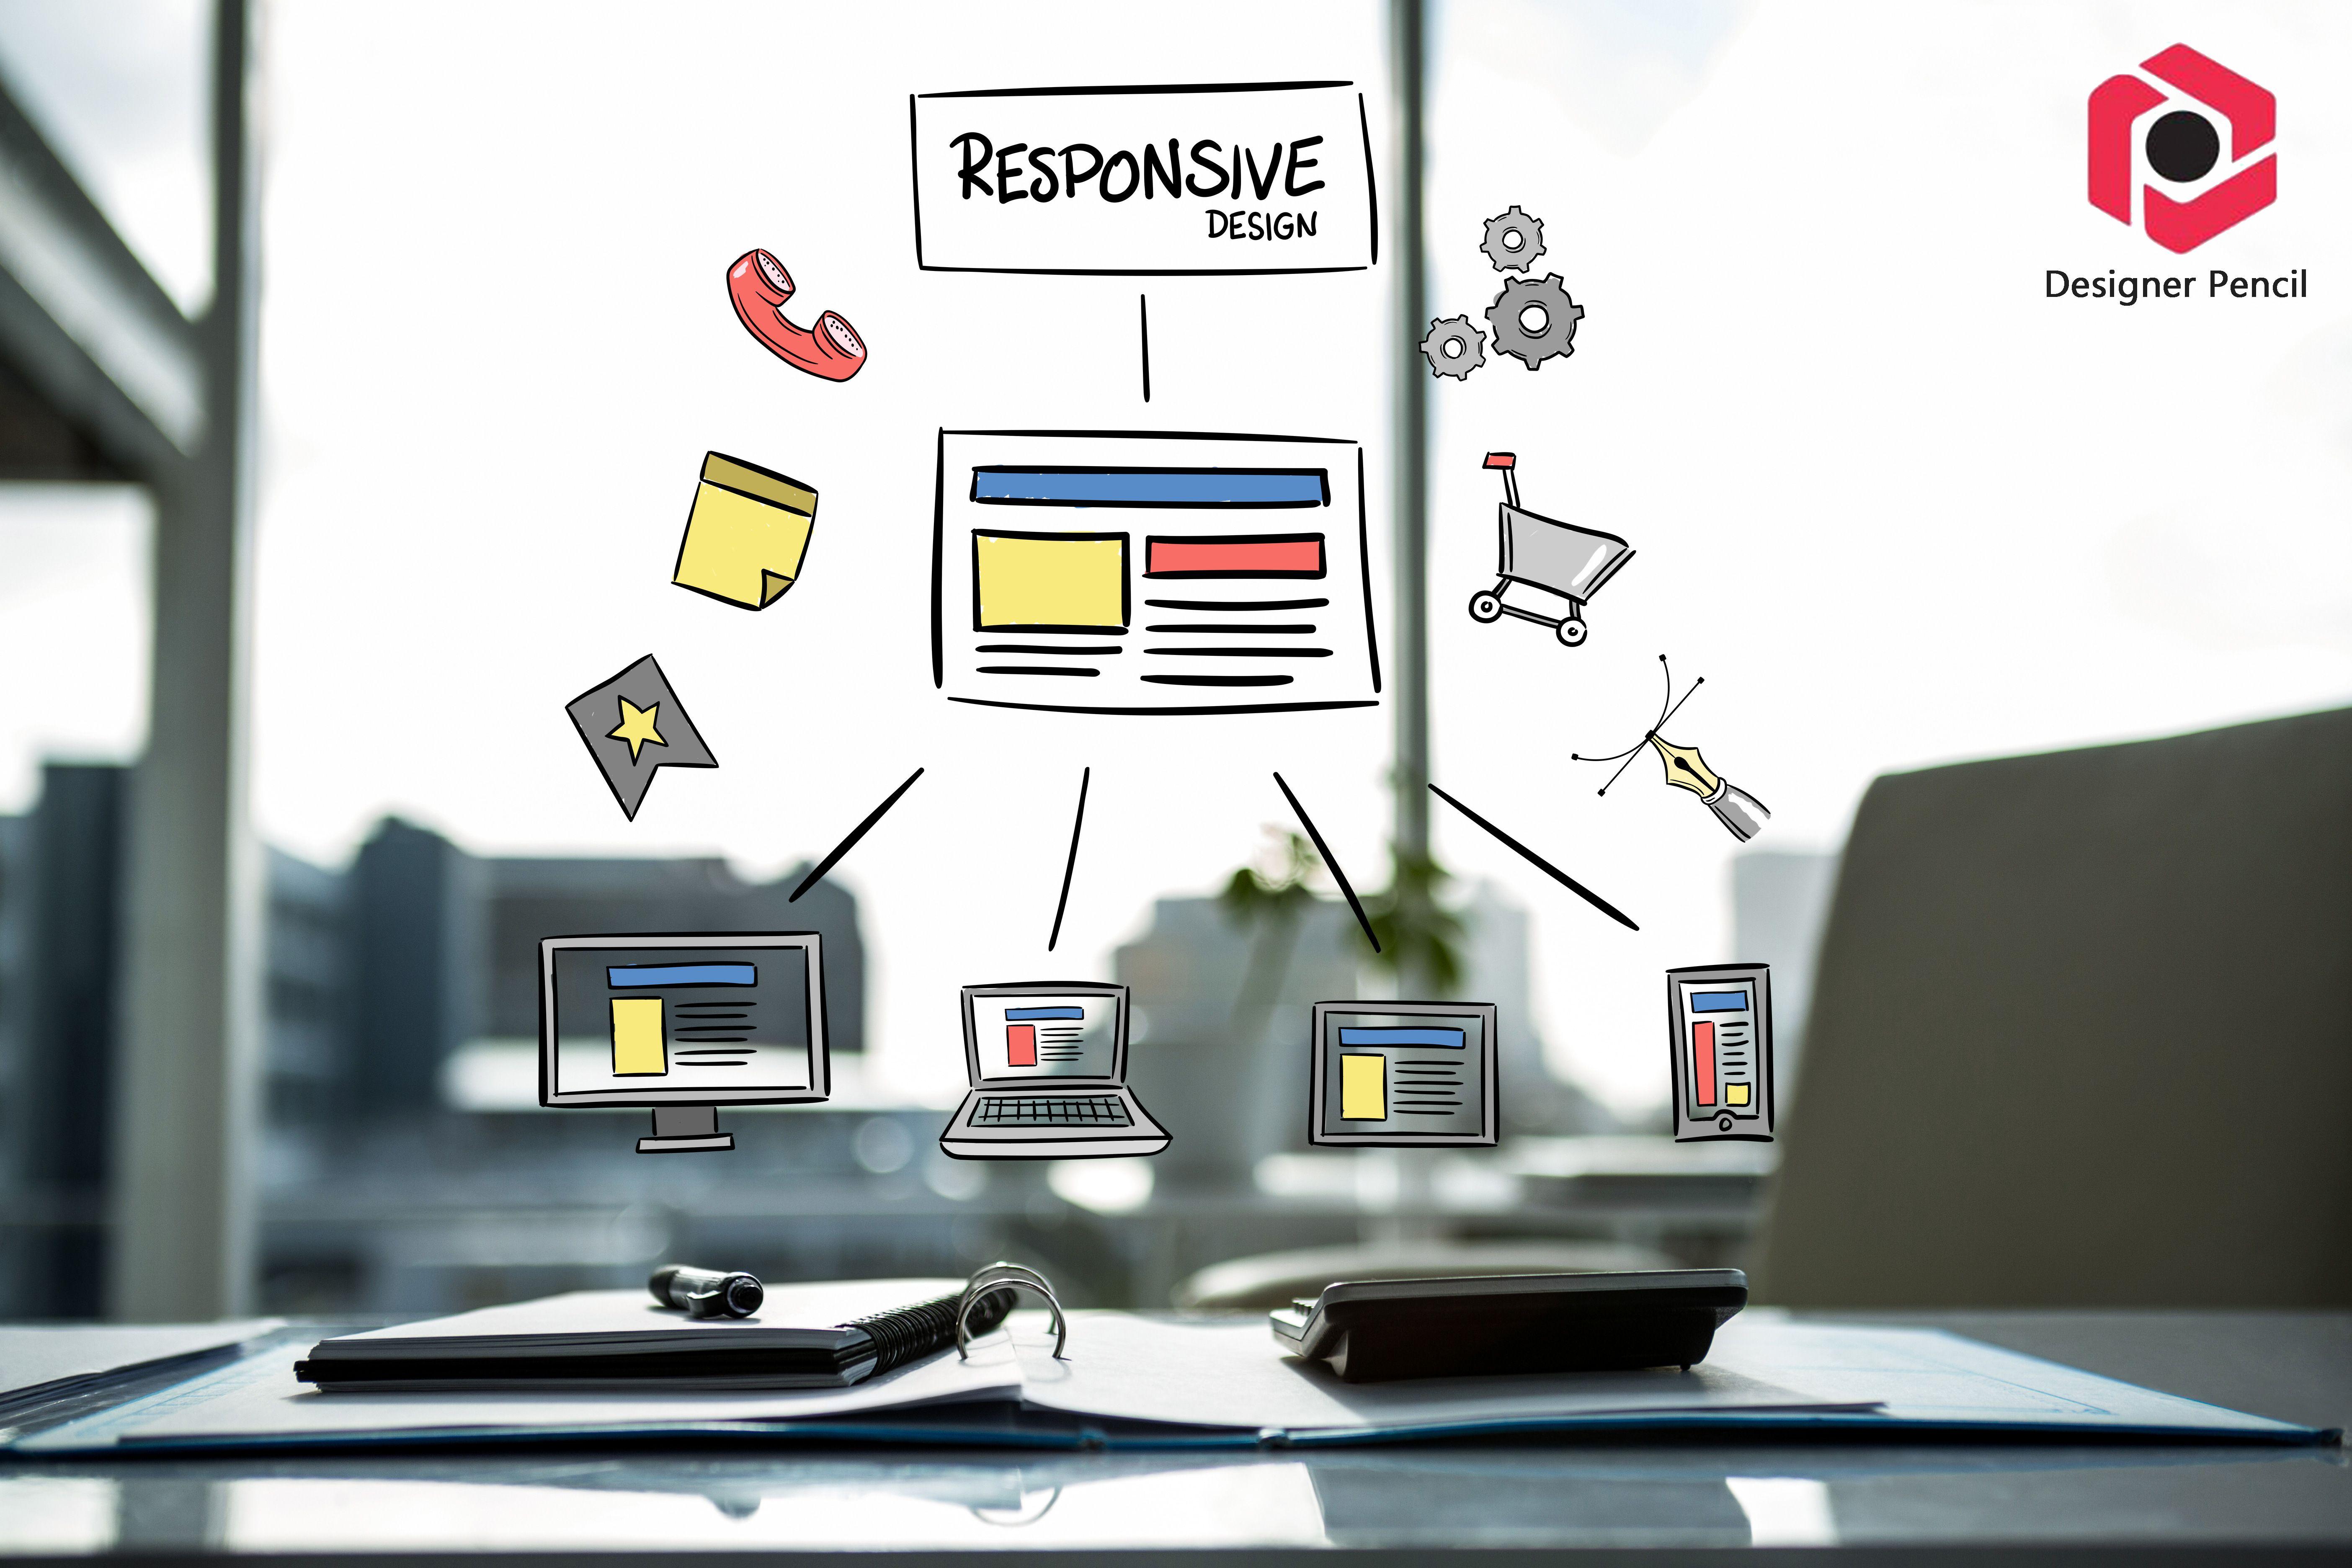 #ResponsiveDesign #WebsiteDevelopment #WebsiteDesign #Webdesigningservice Contact Hires +1(214)3770410